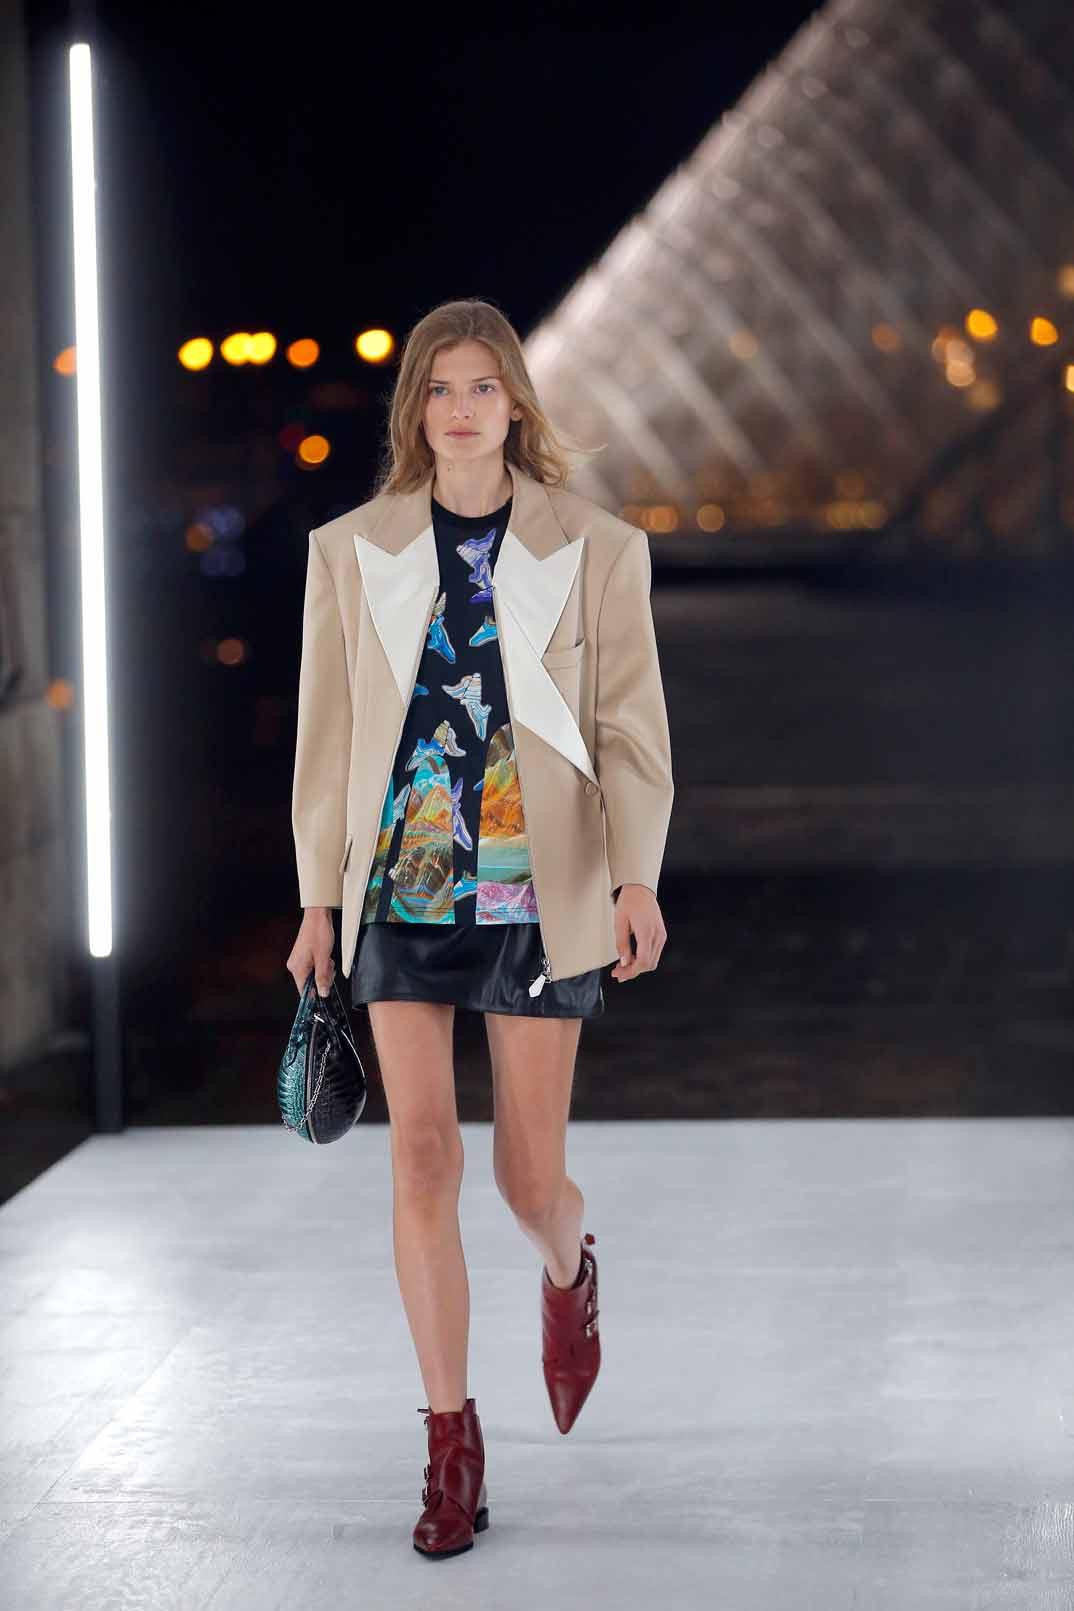 Paris Fashion Week - Louis Vuitton Primavera-Verano 2019